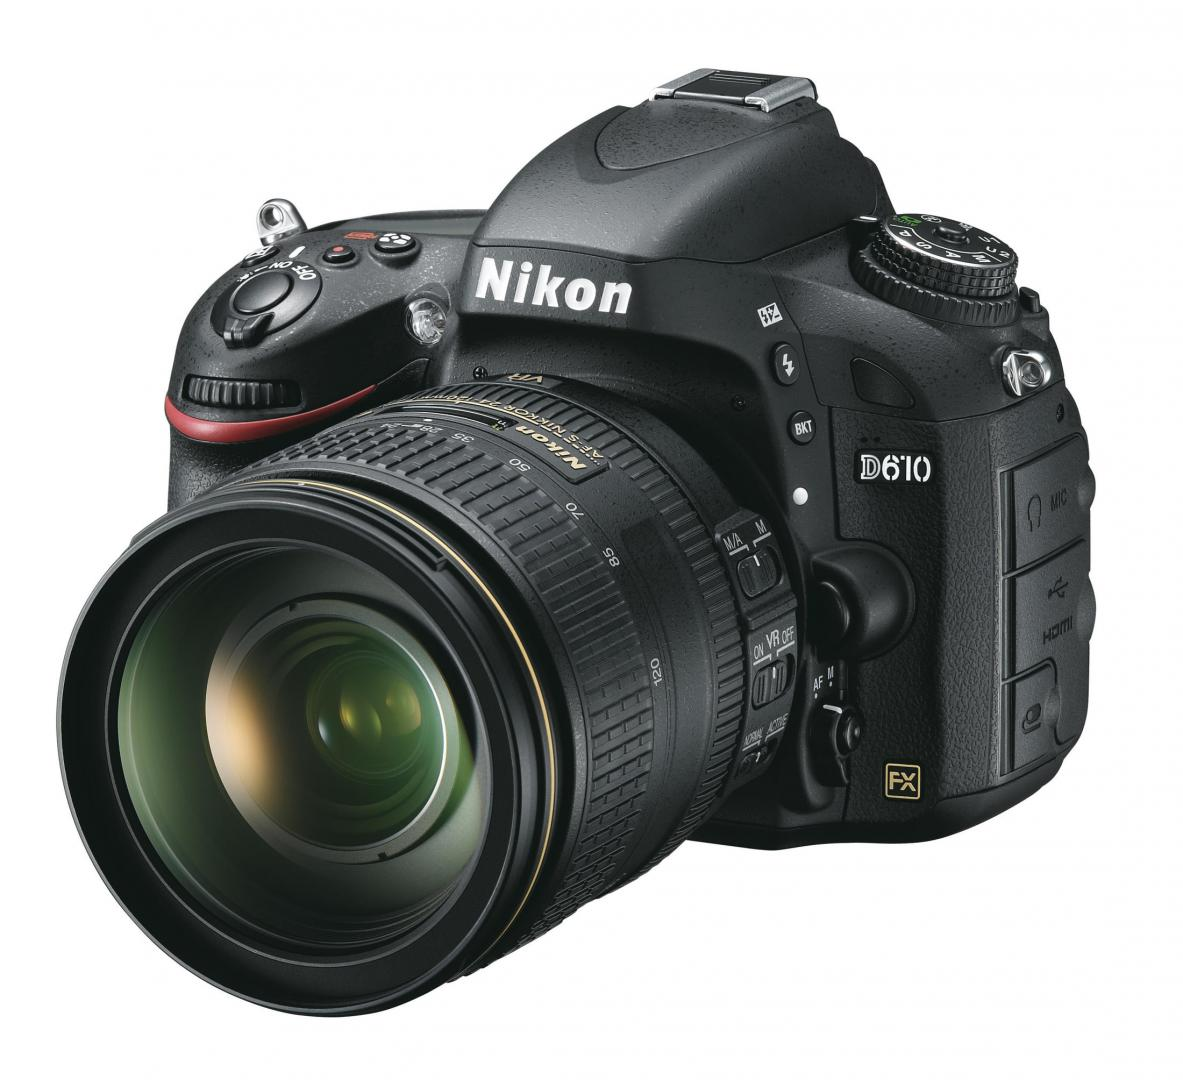 Vollformatkameras im Überblick | DigitalPHOTO